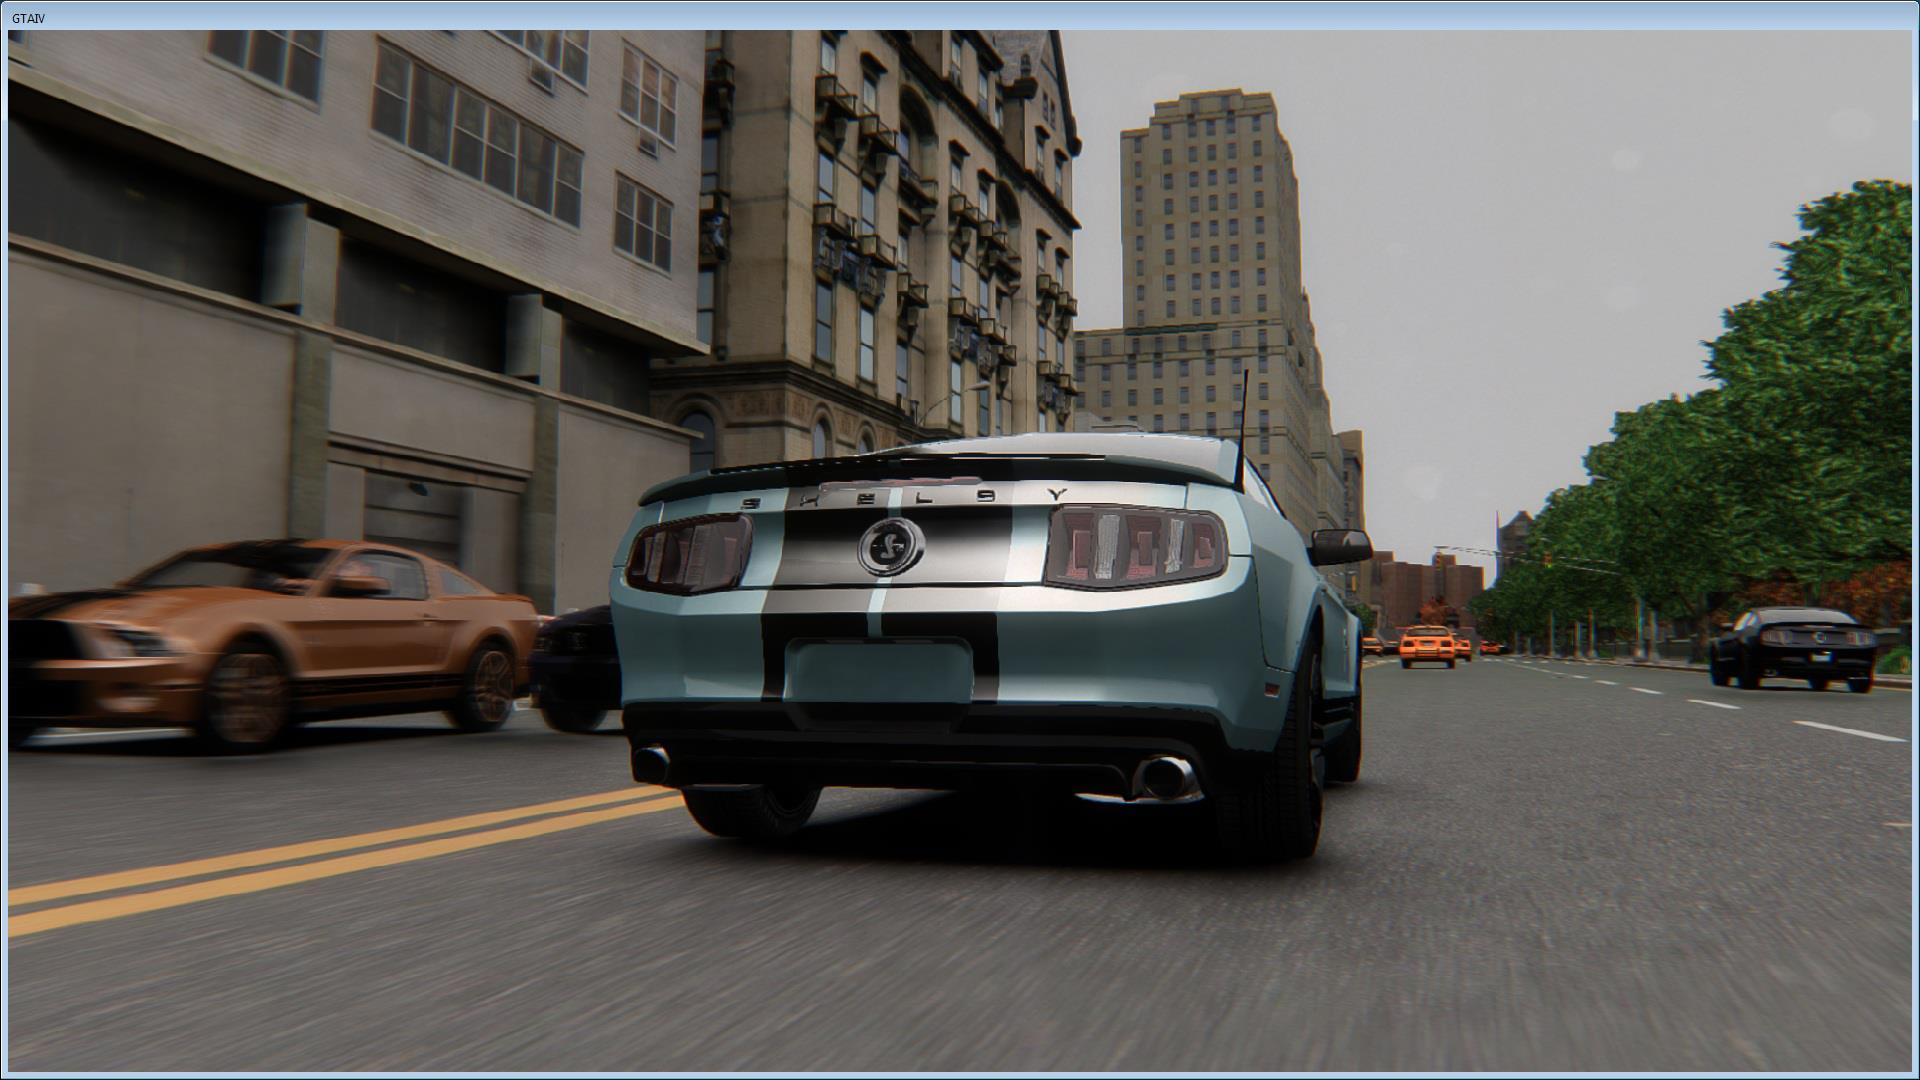 GTA4311203.jpg